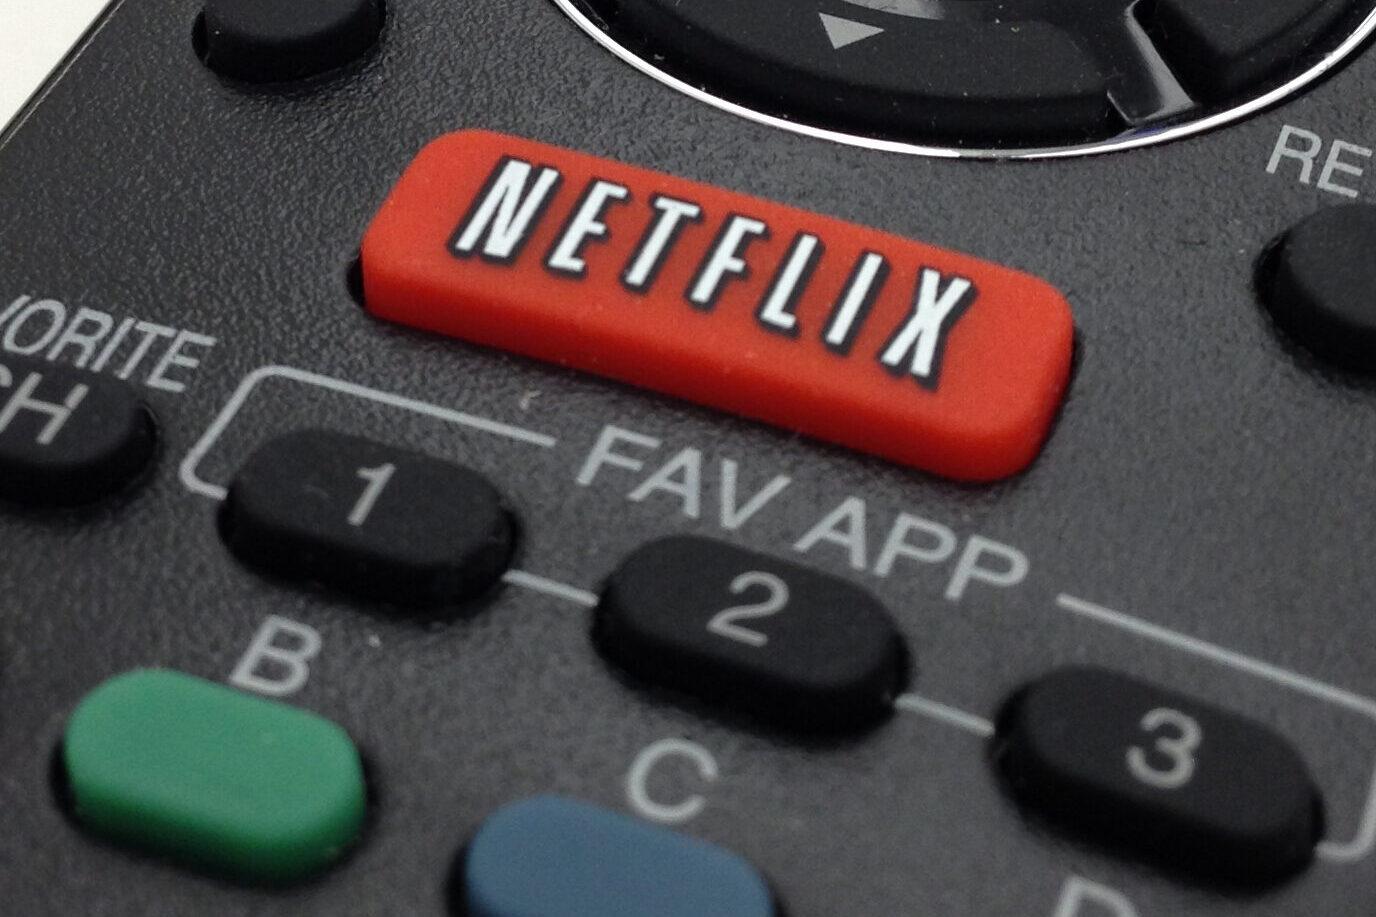 netflix remote feature